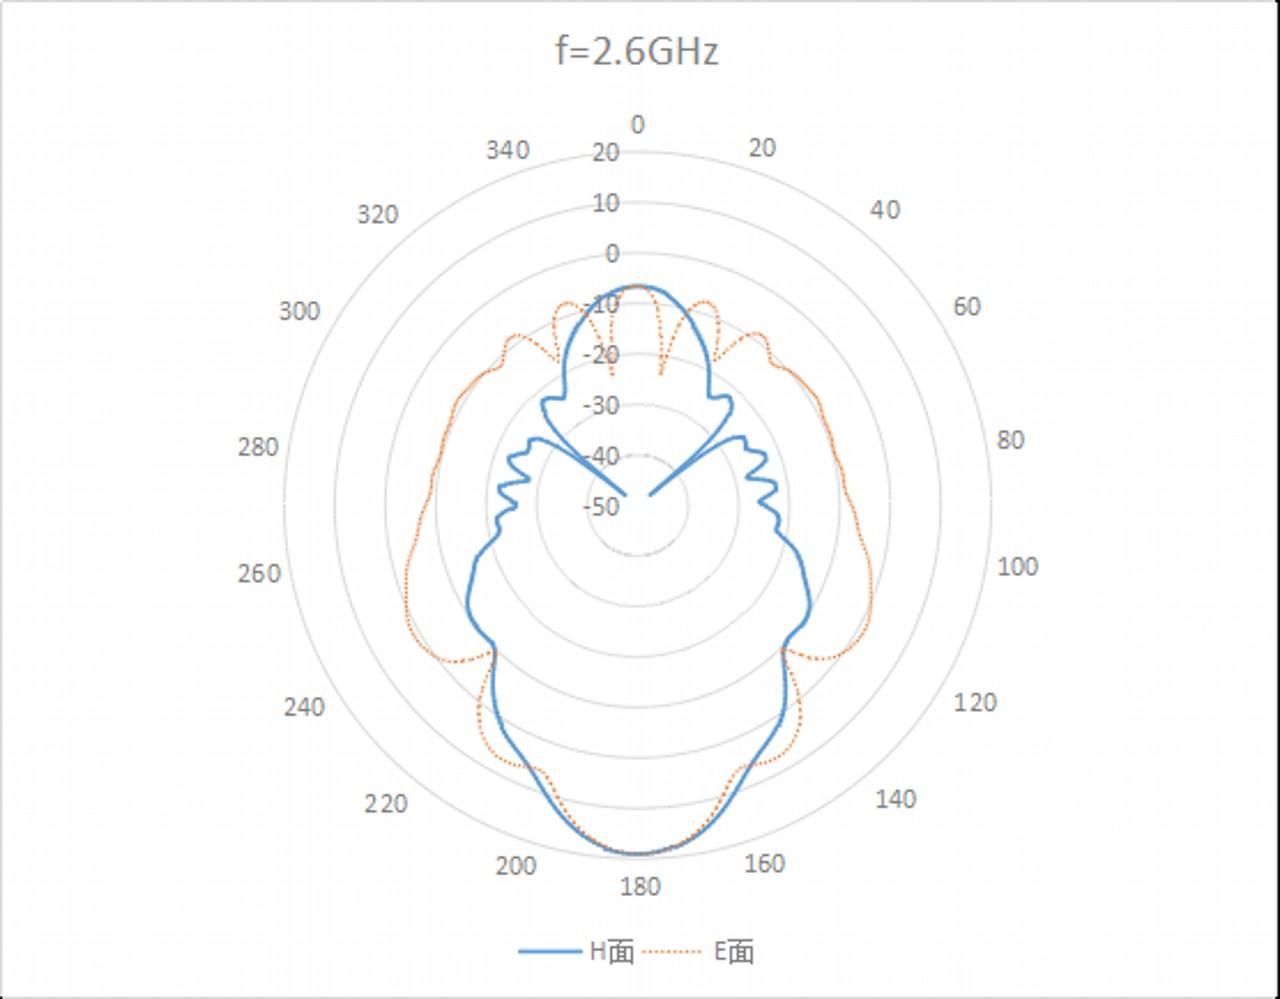 WR-284 Waveguide Standard Gain Horn Antenna. Nominal Gain: 20 dBi Gain. Frequency Range: 2.6 GHz to 4 GHz - 1